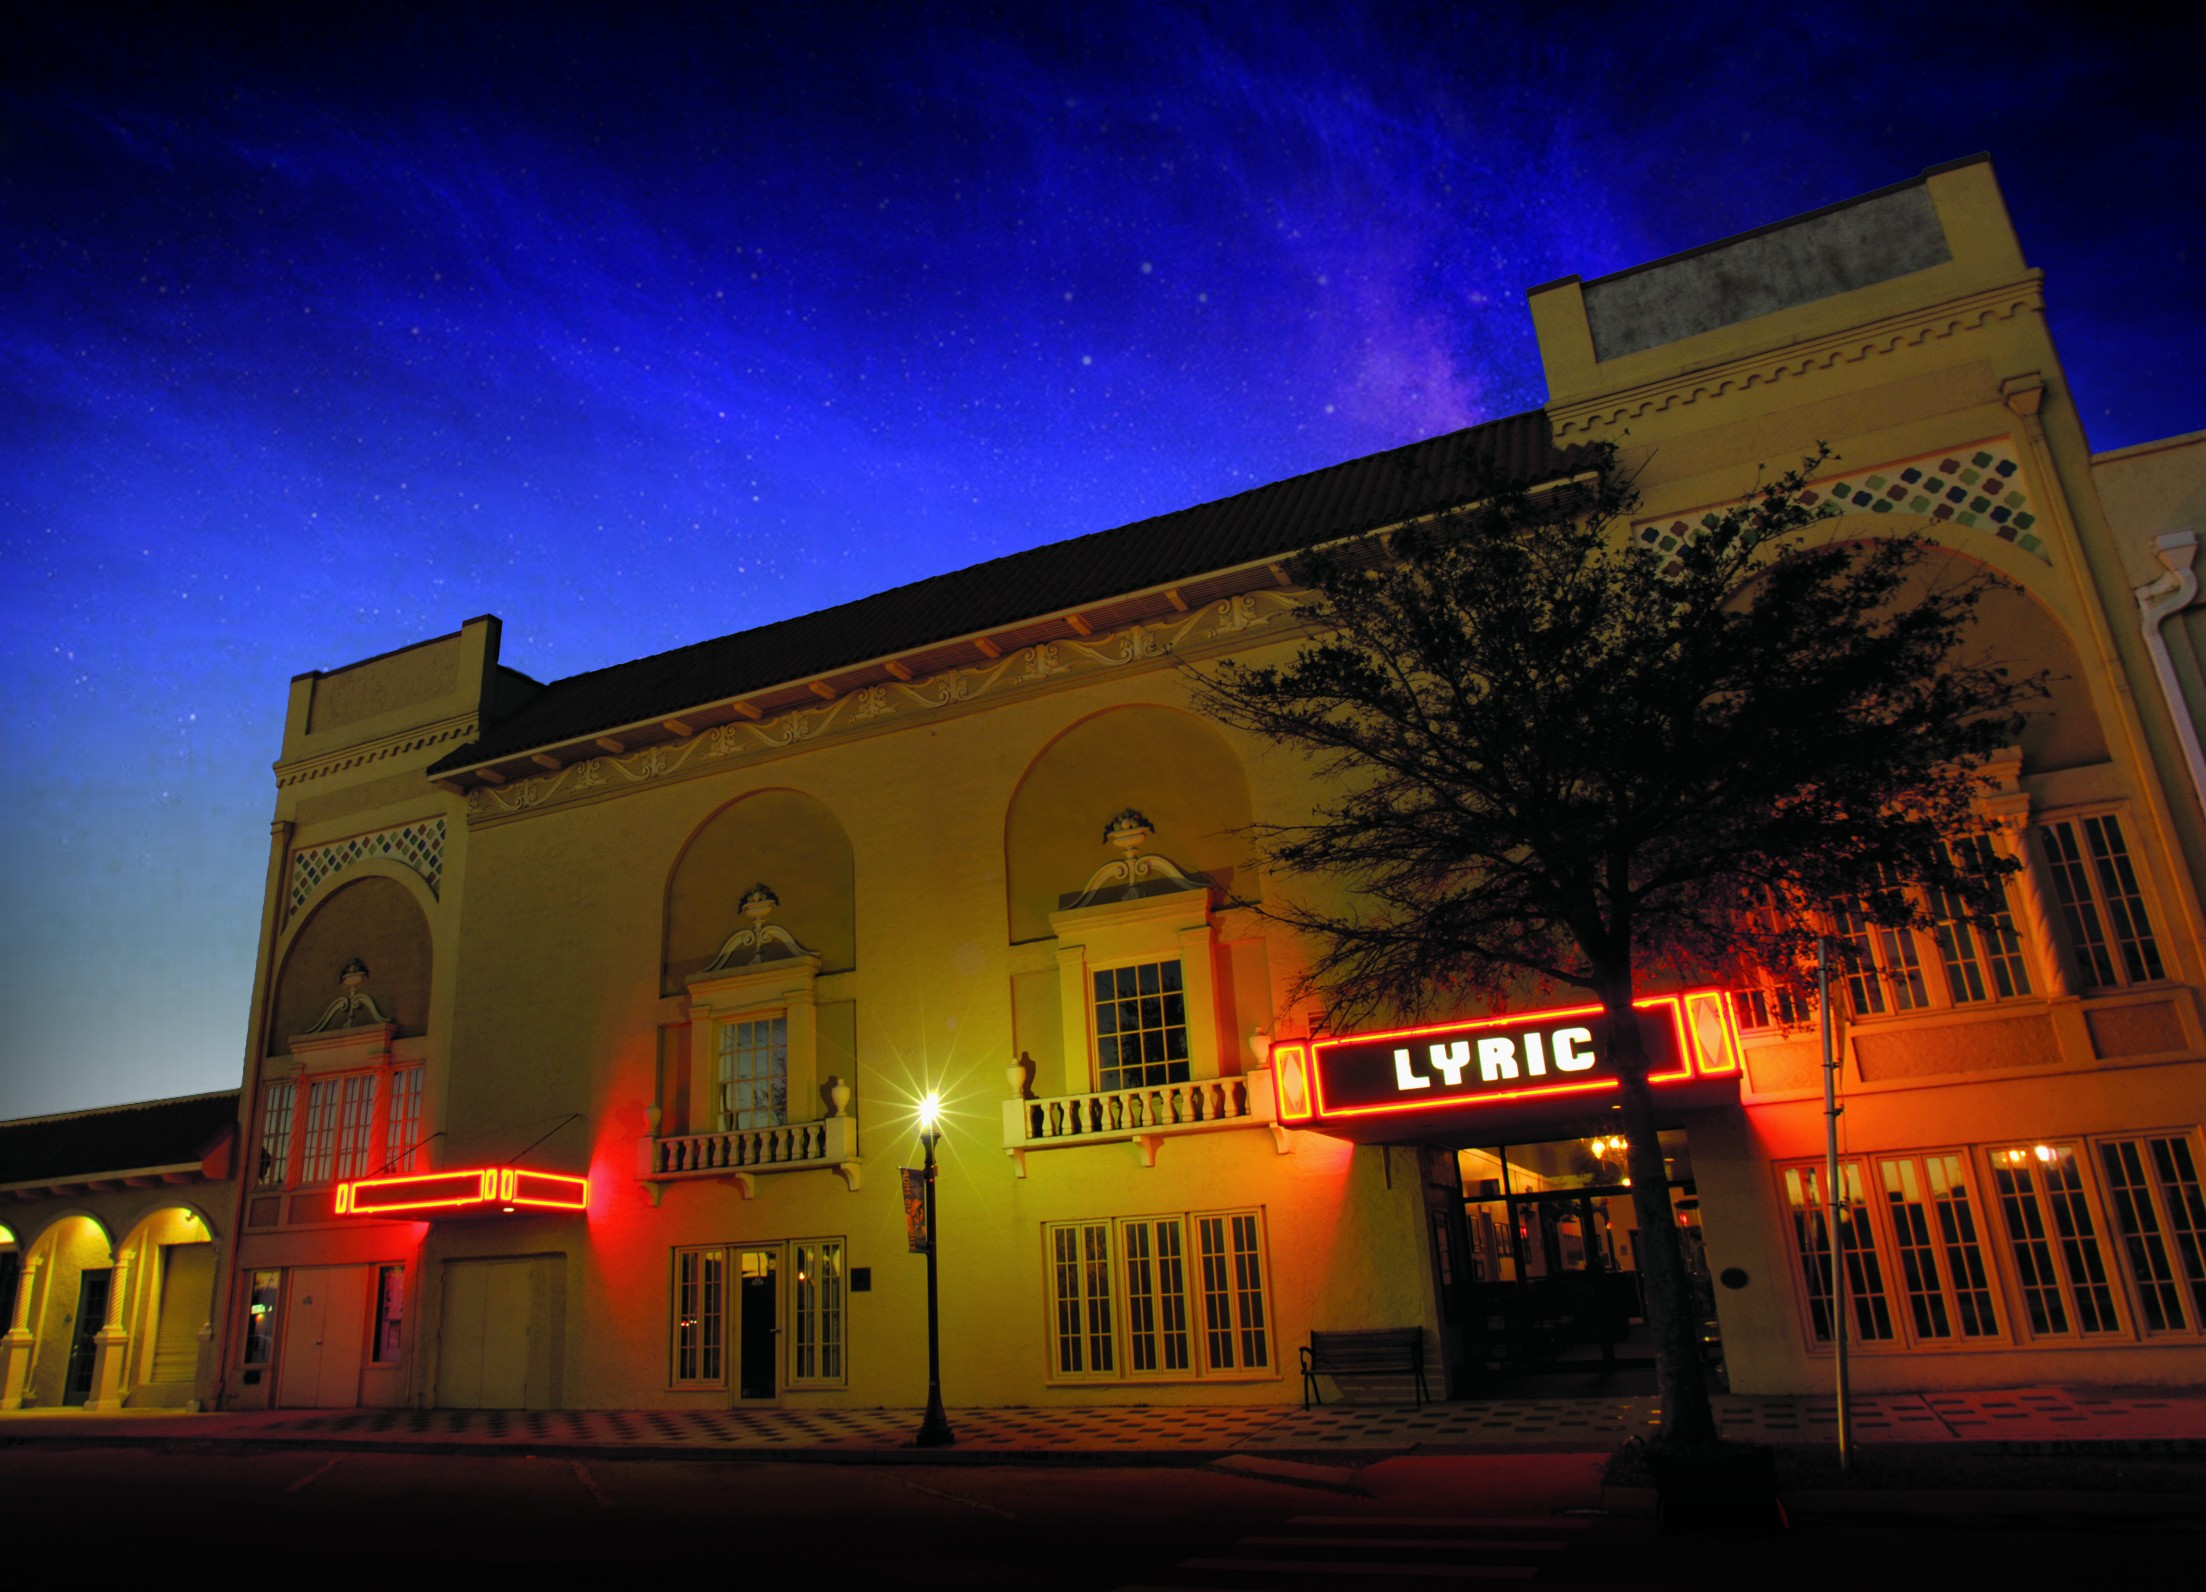 lyric theatre 59 sw flagler ave stuart fl location